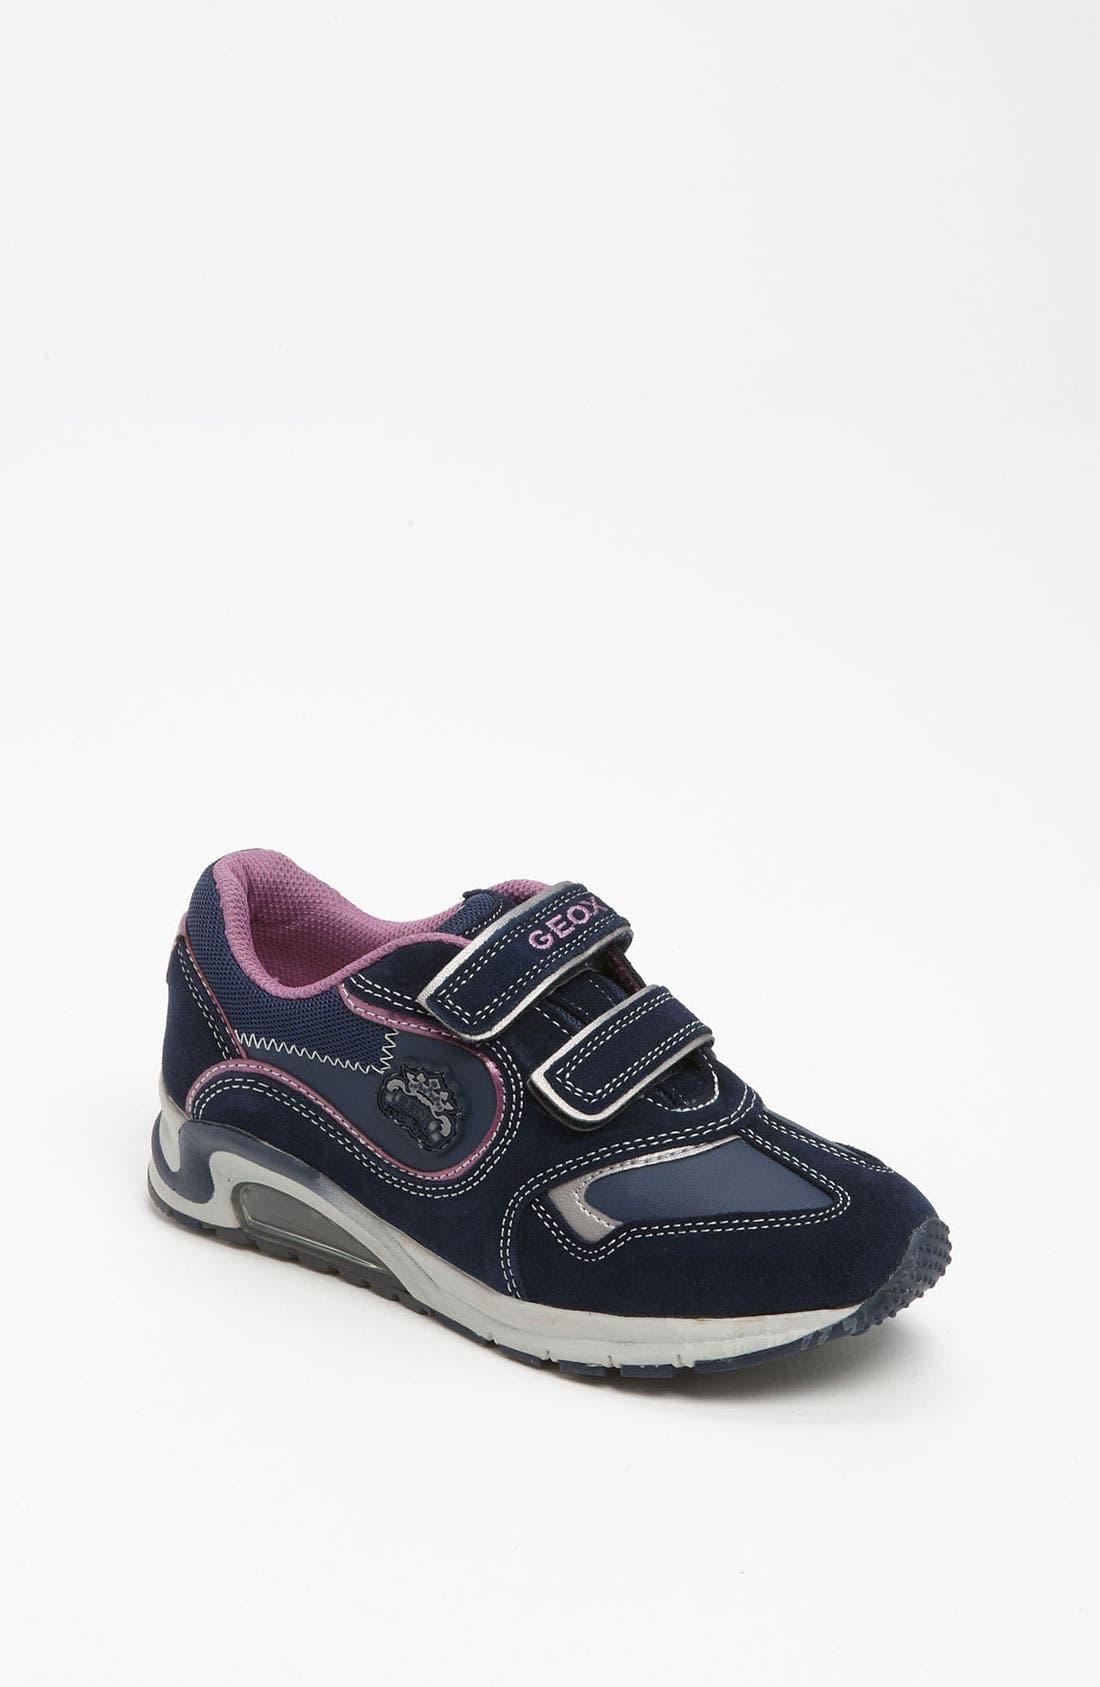 Main Image - Geox 'Shaky' Sneaker (Toddler, Little Kid & Big Kid)